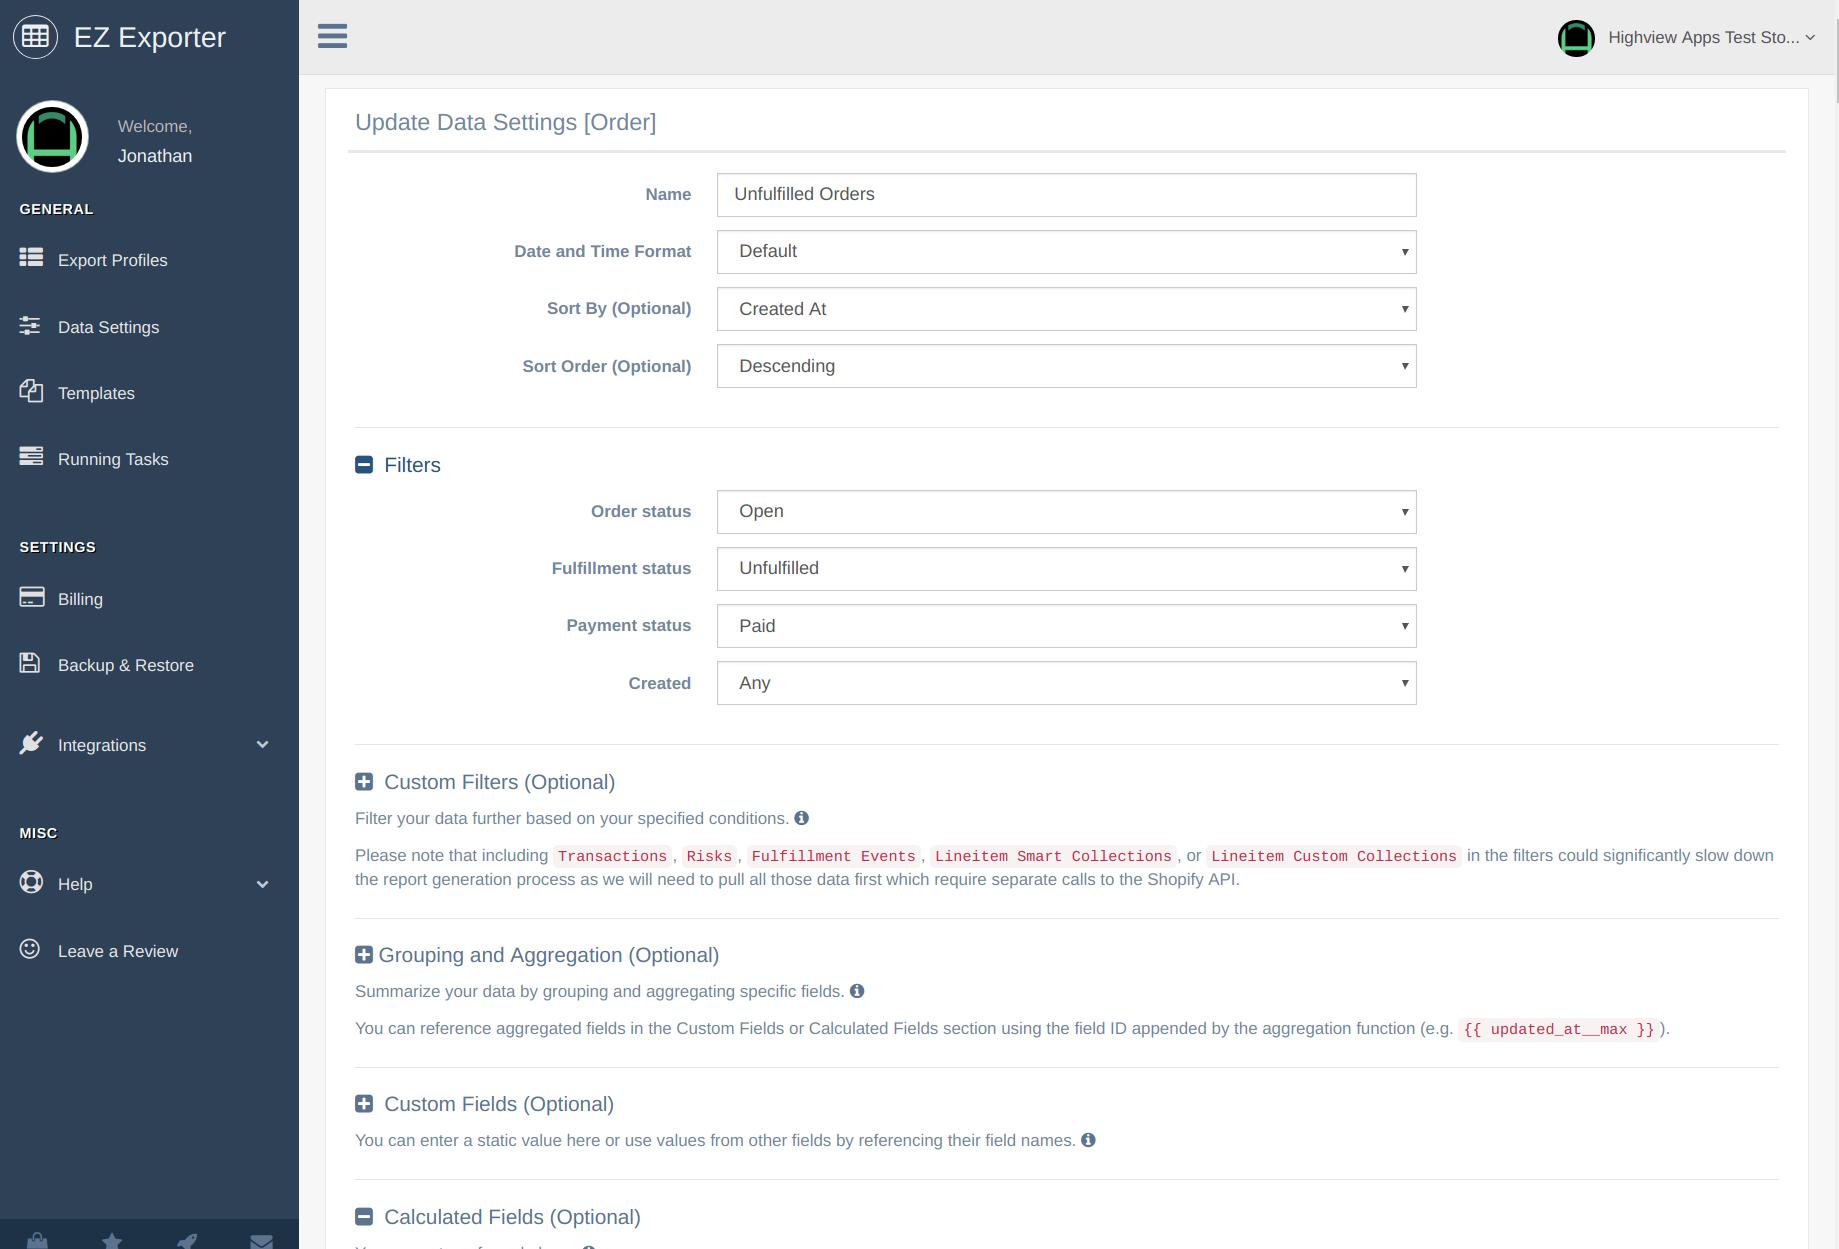 EZ Exporter Documentation | Highview Apps